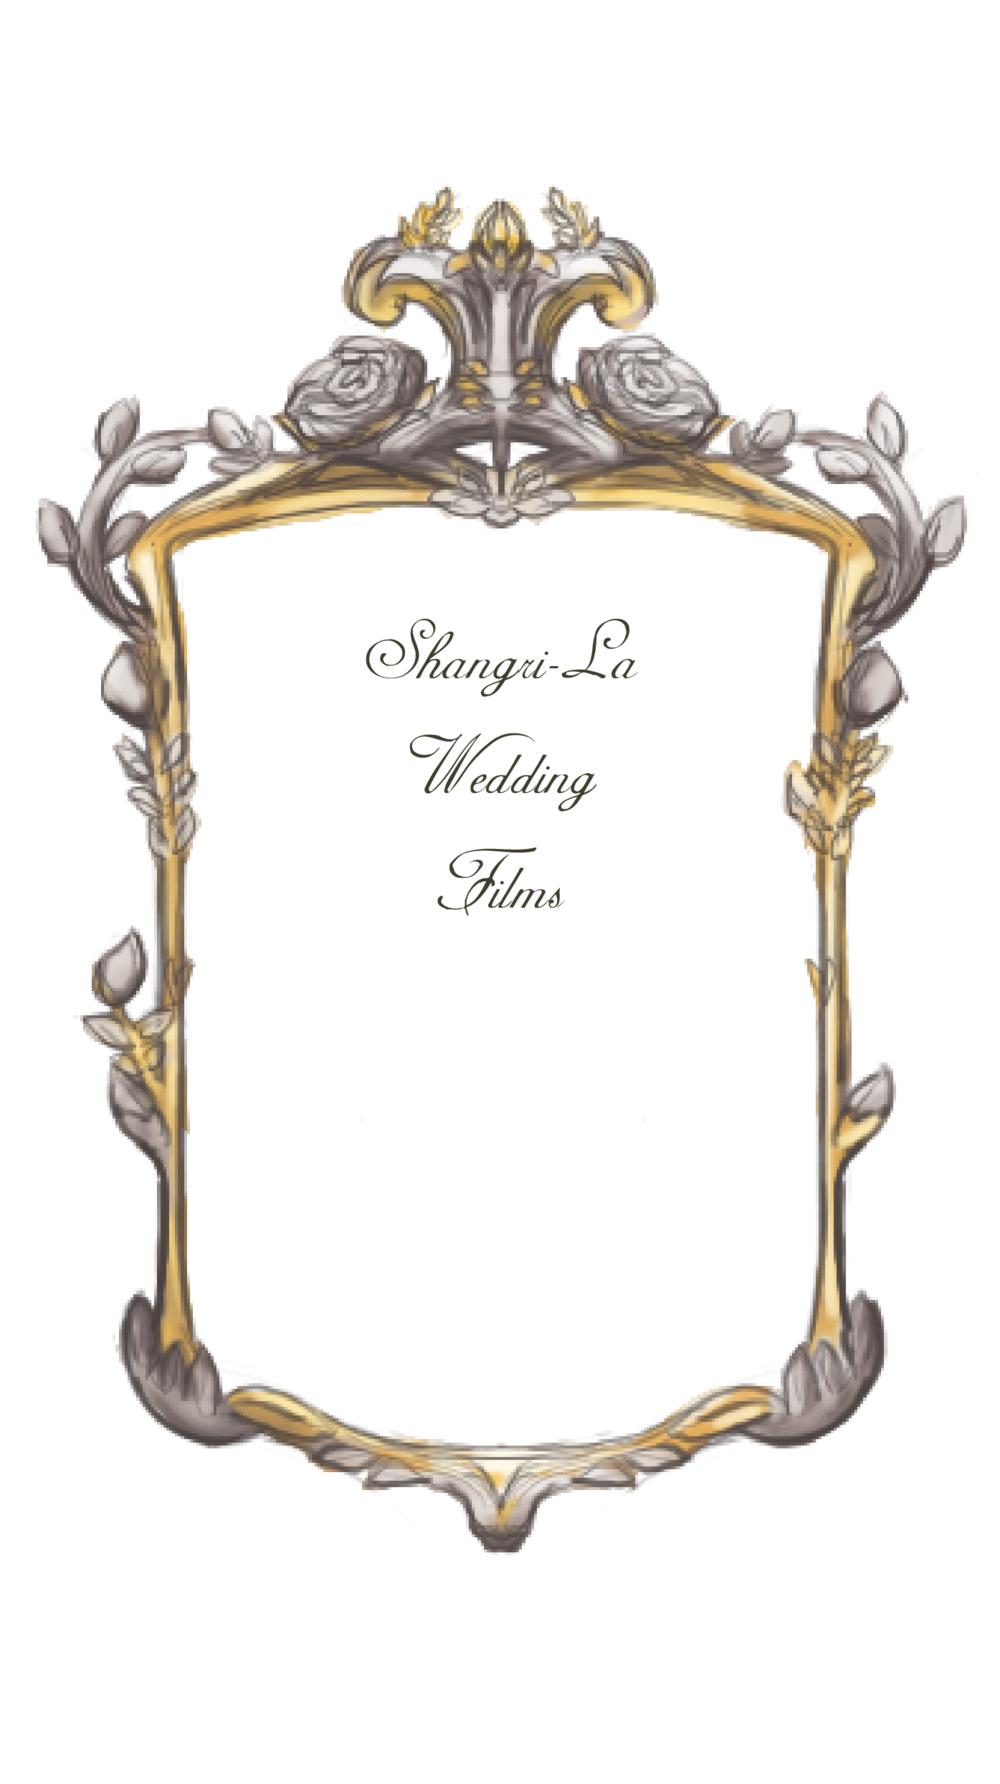 Shangri-La Wedding Filmslogo